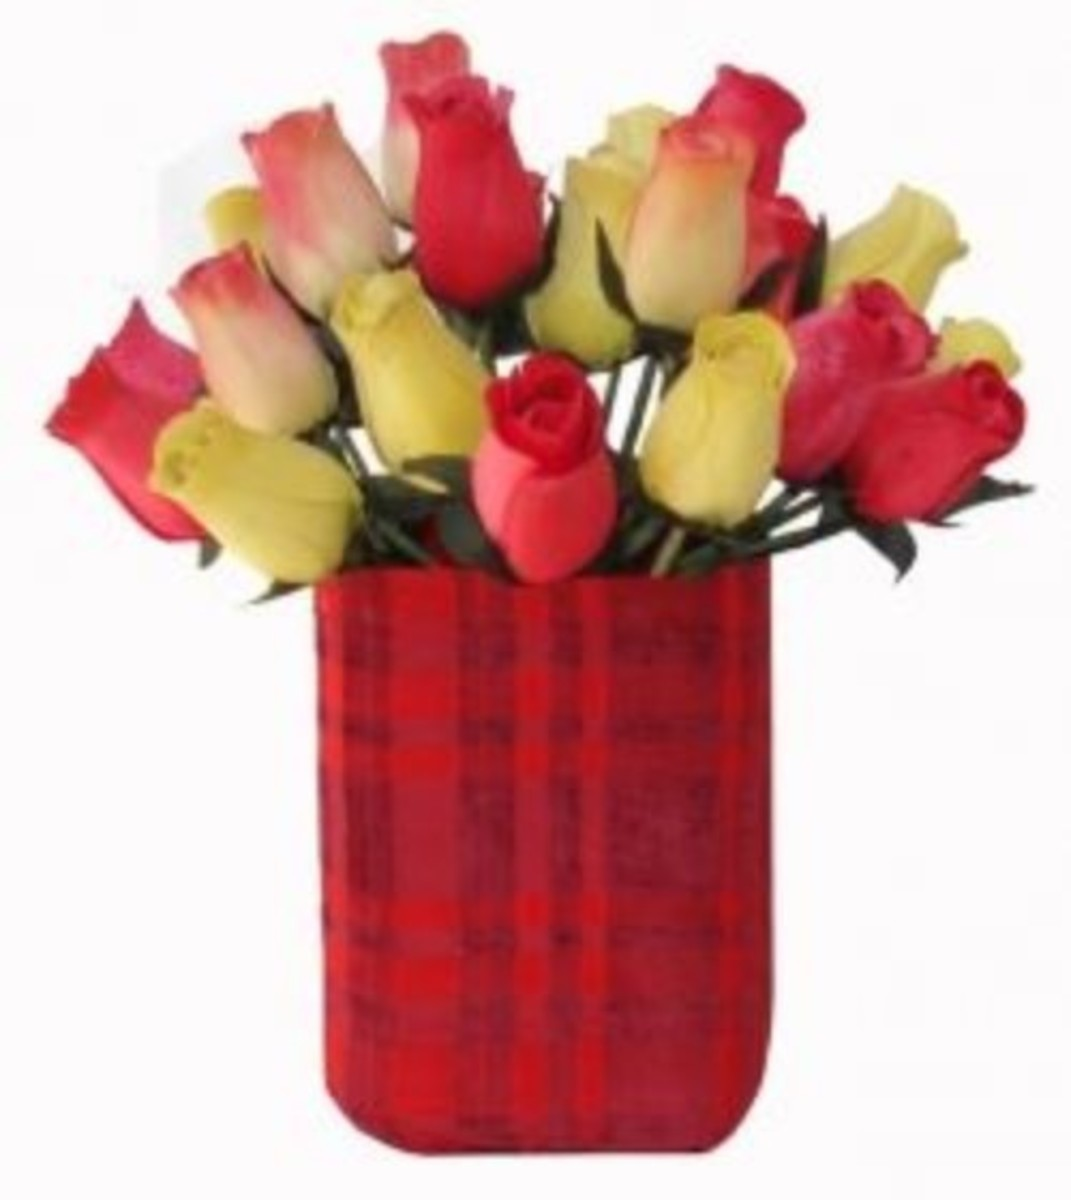 Reuse a Plastic Bottle as a Charming Vase